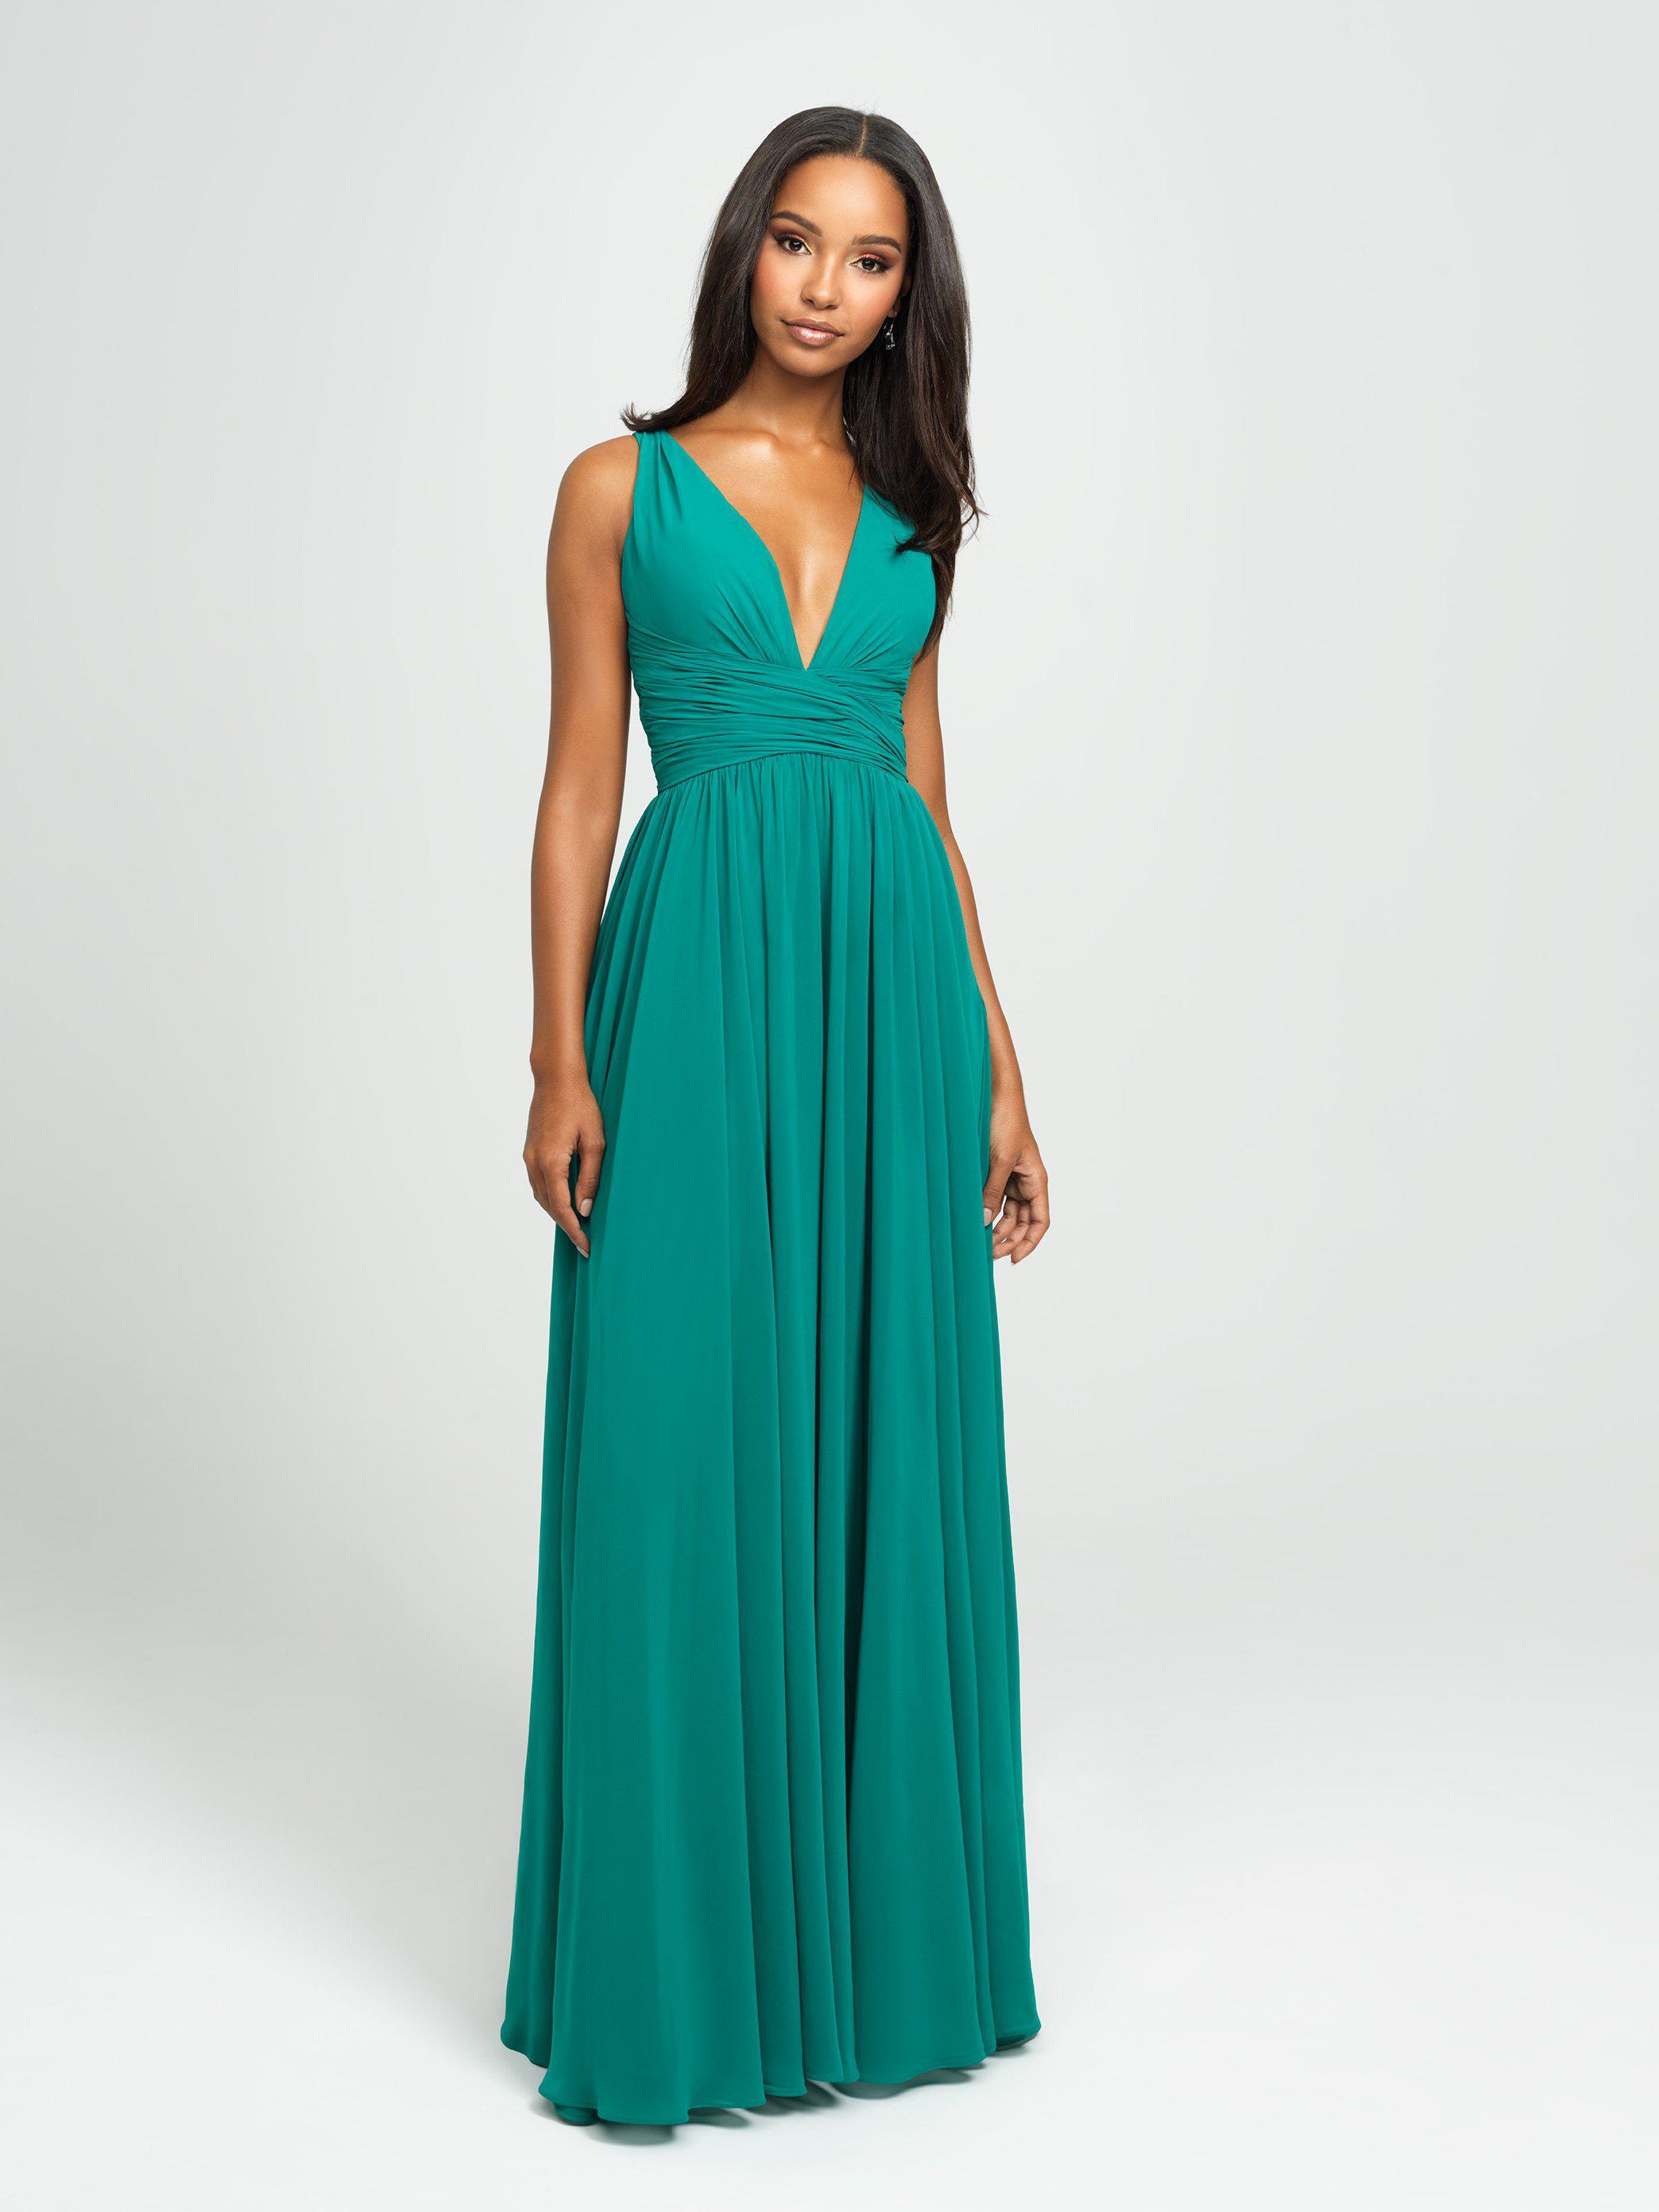 6d18dc12c7e7 Madison James. Women's Green 19-193 Plunging Neck Empire Waist Chiffon A-line  Gown